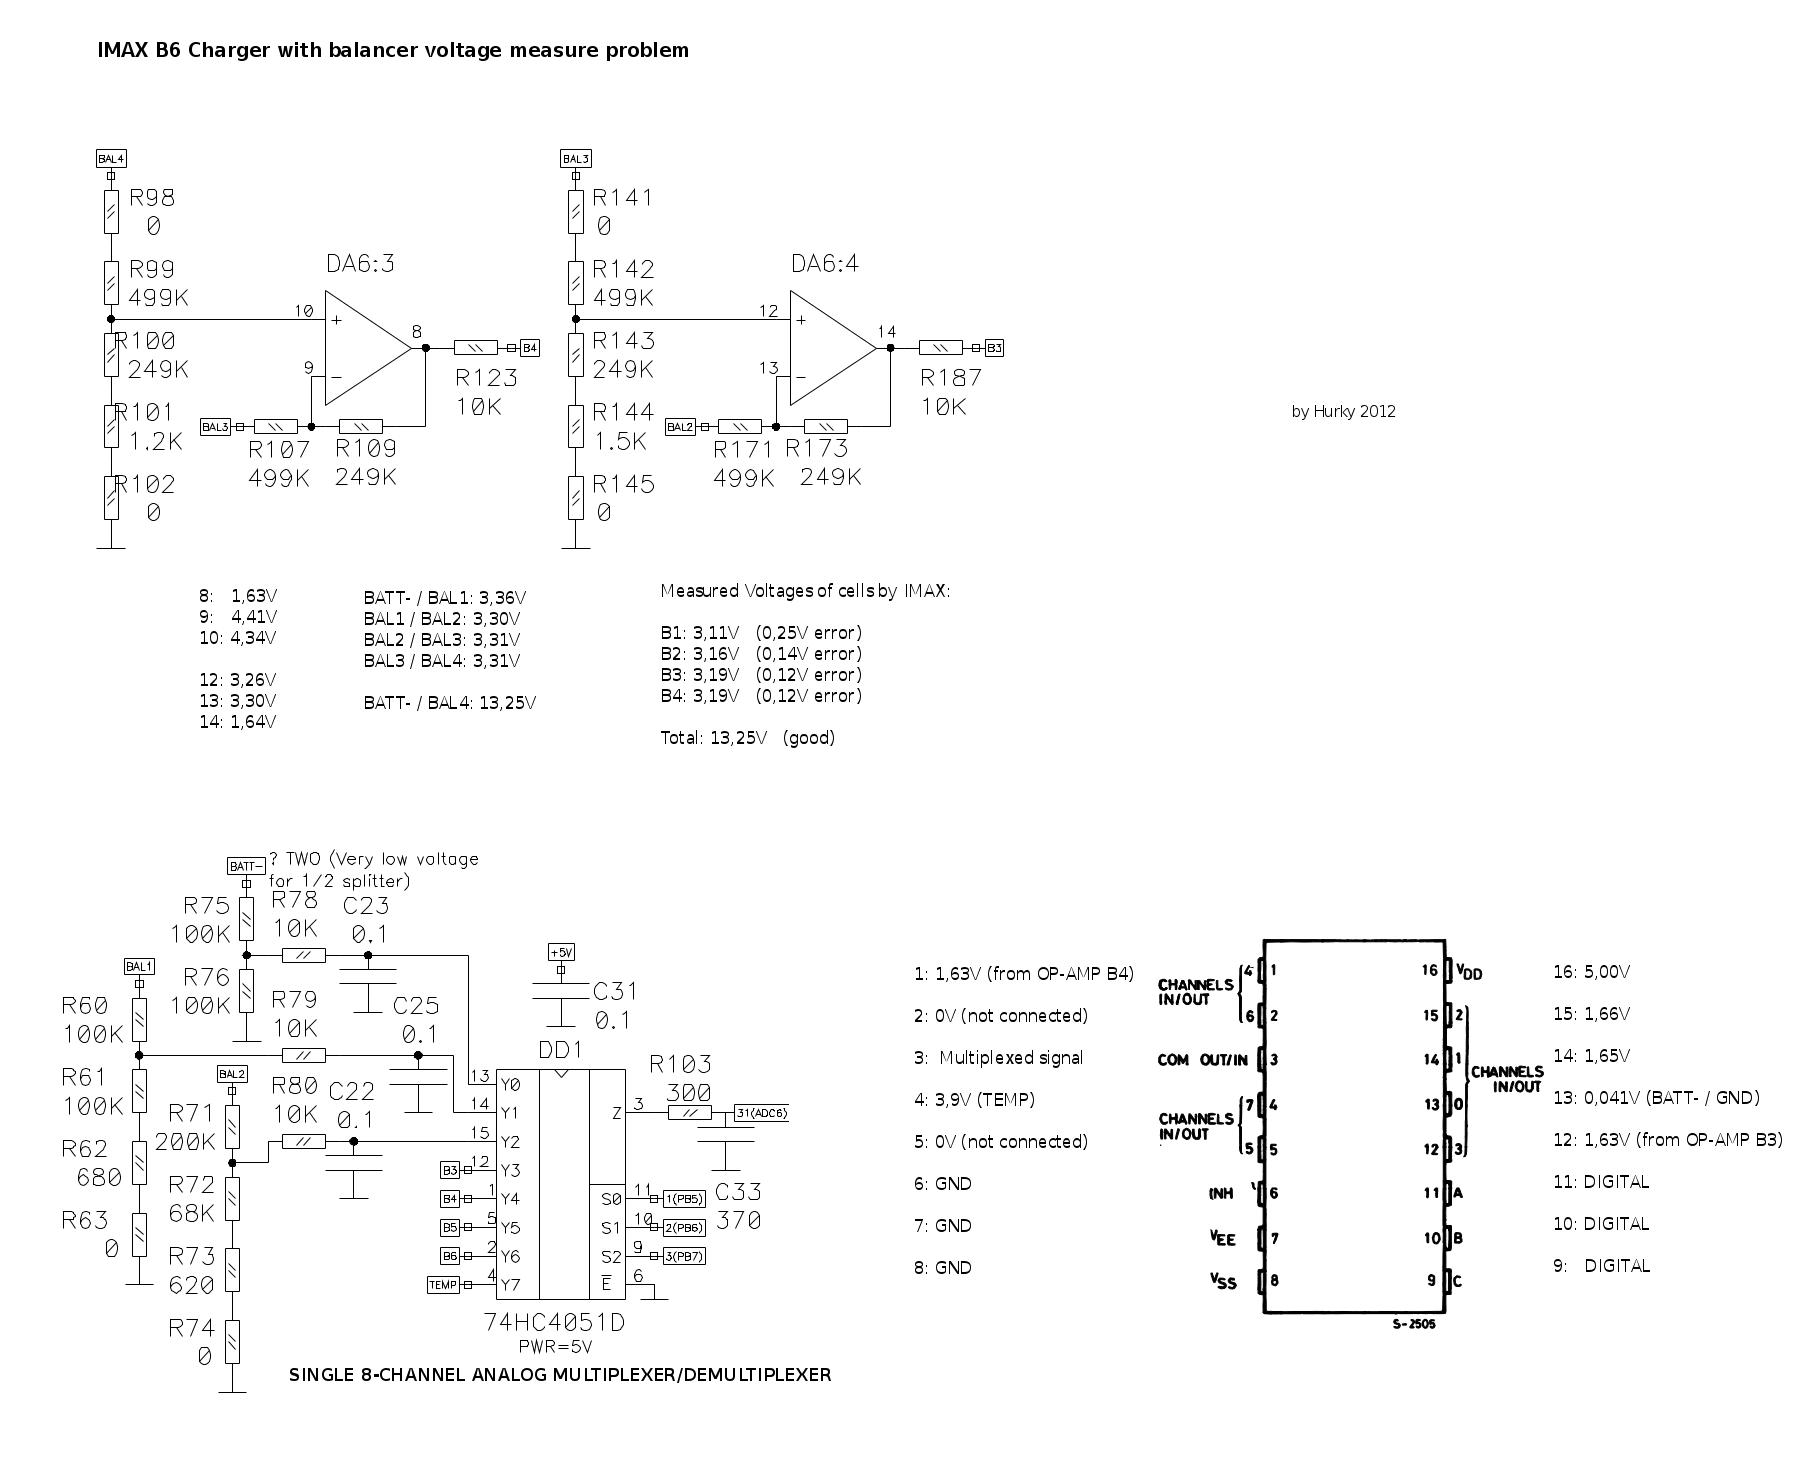 lipro balance charger imax b6 manual